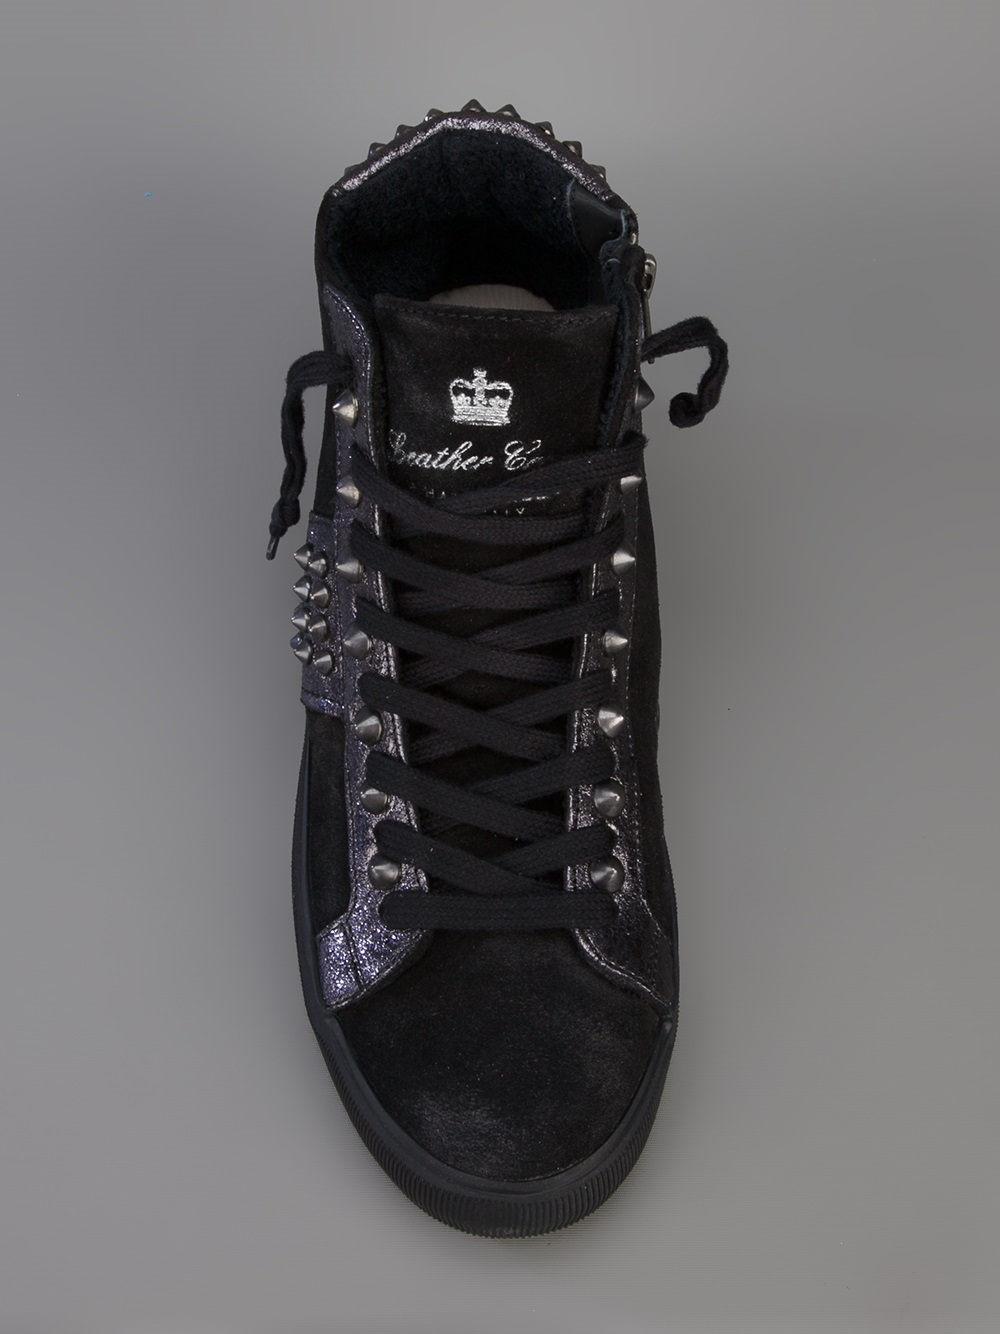 Leather Crown Hightop Trainer in Black